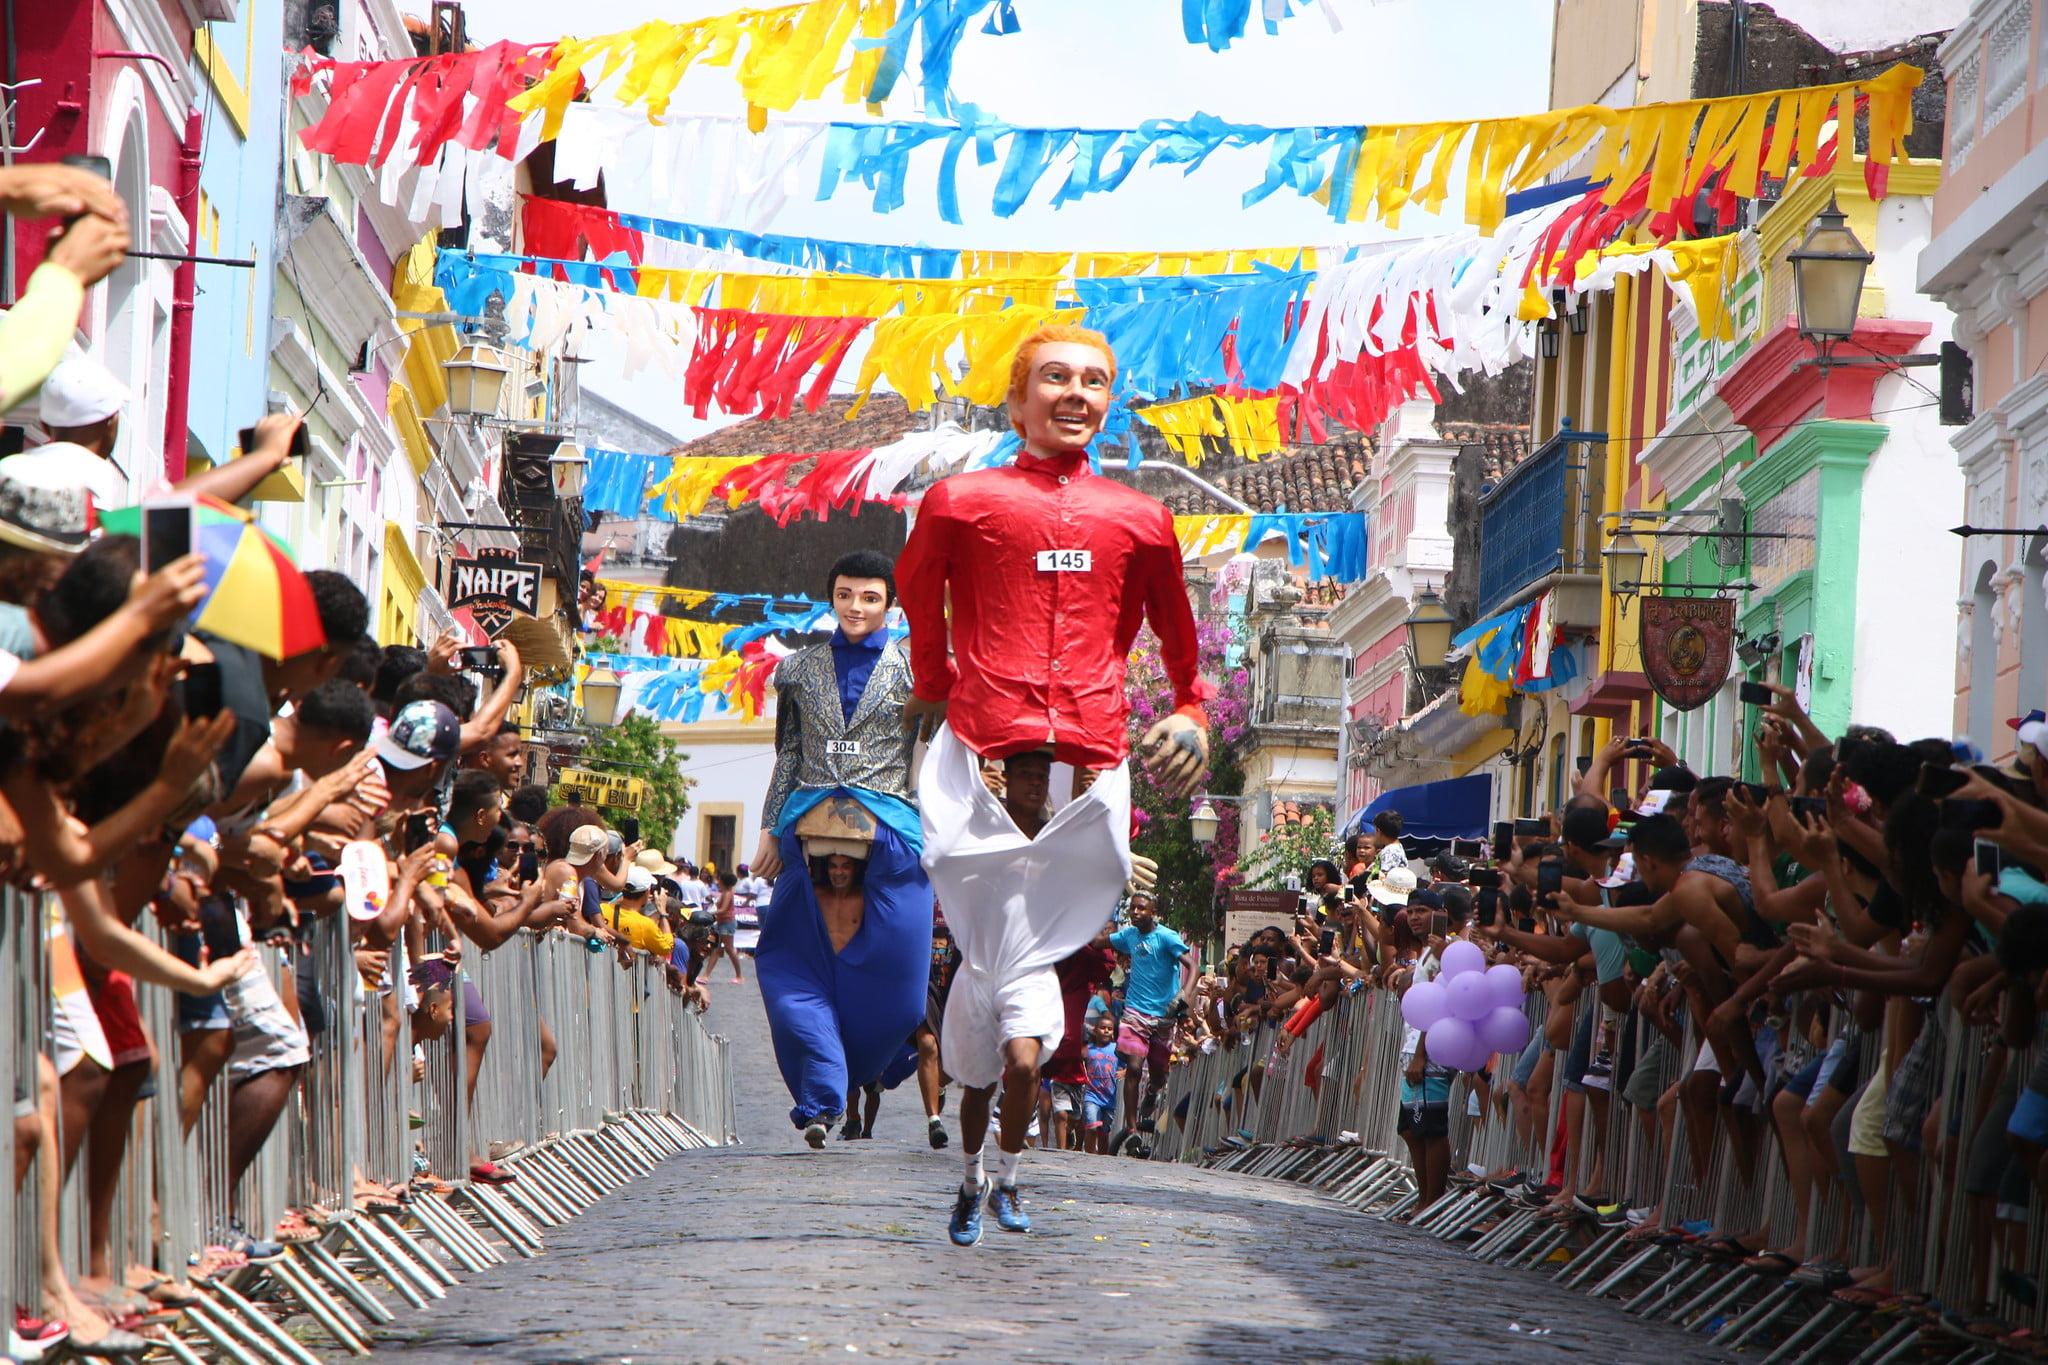 Tradicional Corrida dos Bonecos Gigantes de Olinda acontece neste sábado